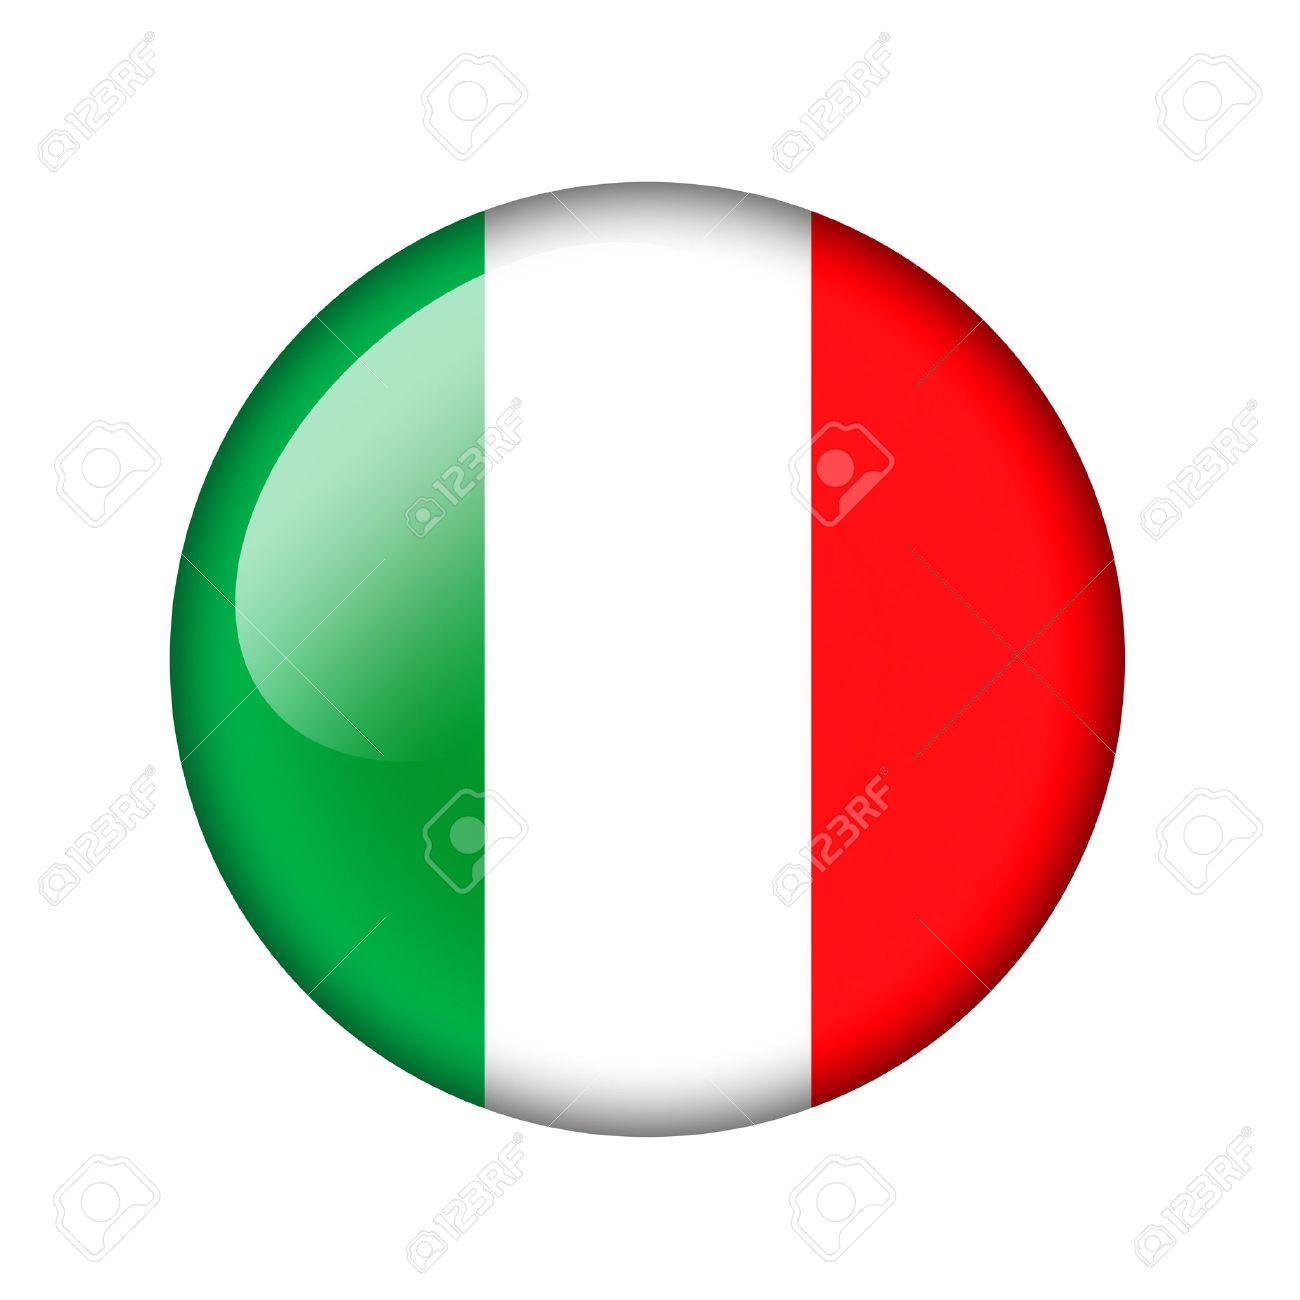 51968033-le-drapeau-italien-round-glossy-icon-isol%C3%A9-sur-fond-blanc-.jpg